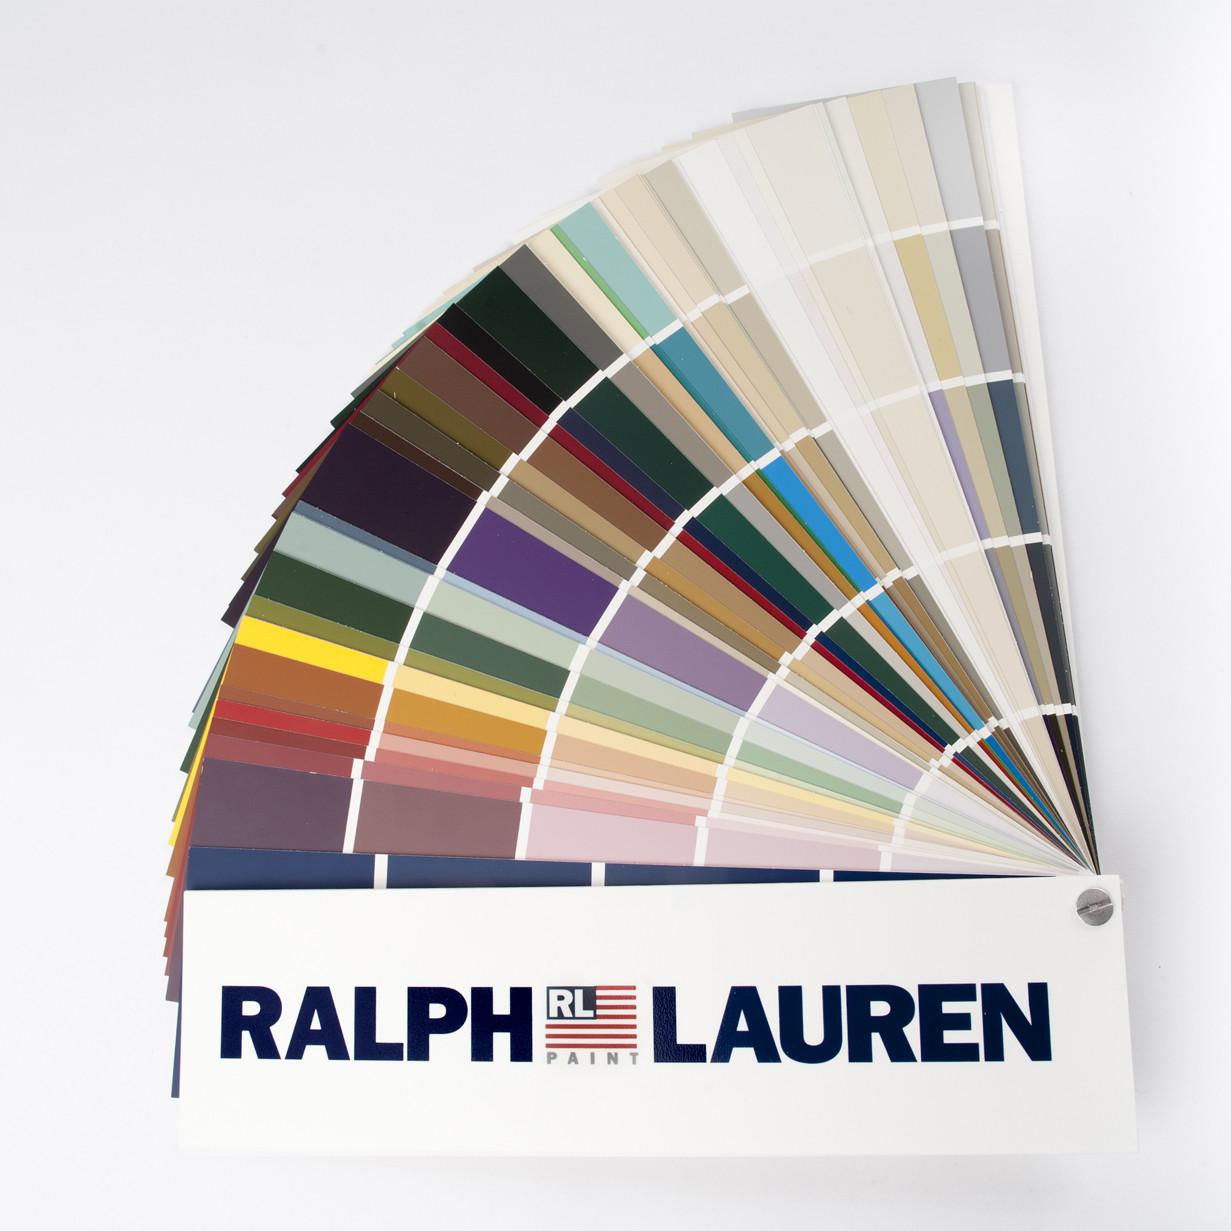 Best ideas about Ralph Lauren Paint Colors . Save or Pin Read This Ralph Lauren Paint Review Now.